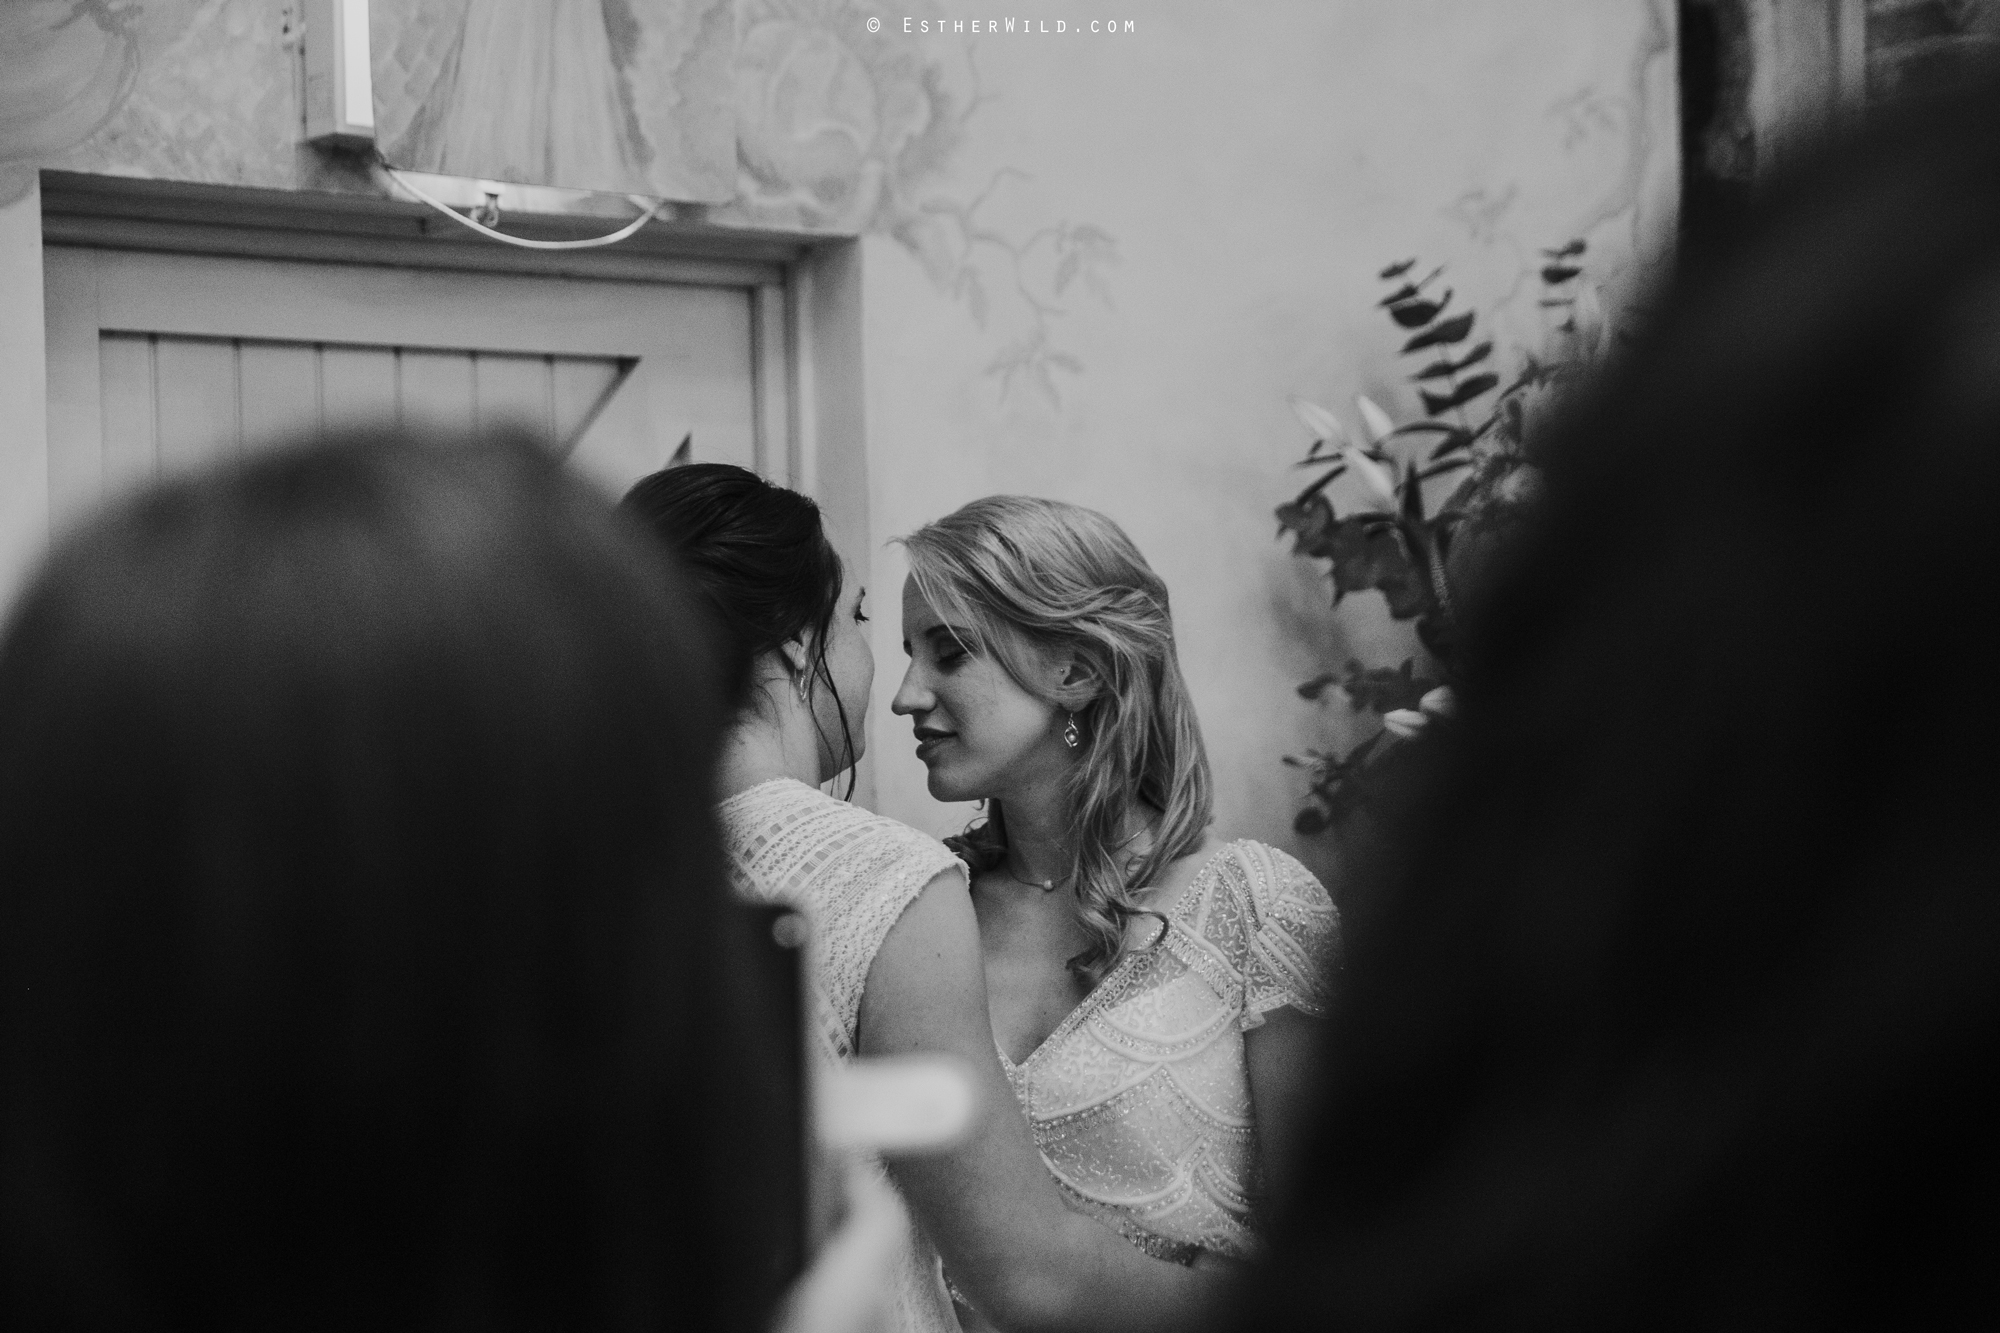 Elms_Barn_Weddings_Suffolk_Photographer_Copyright_Esther_Wild_IMG_2467.jpg